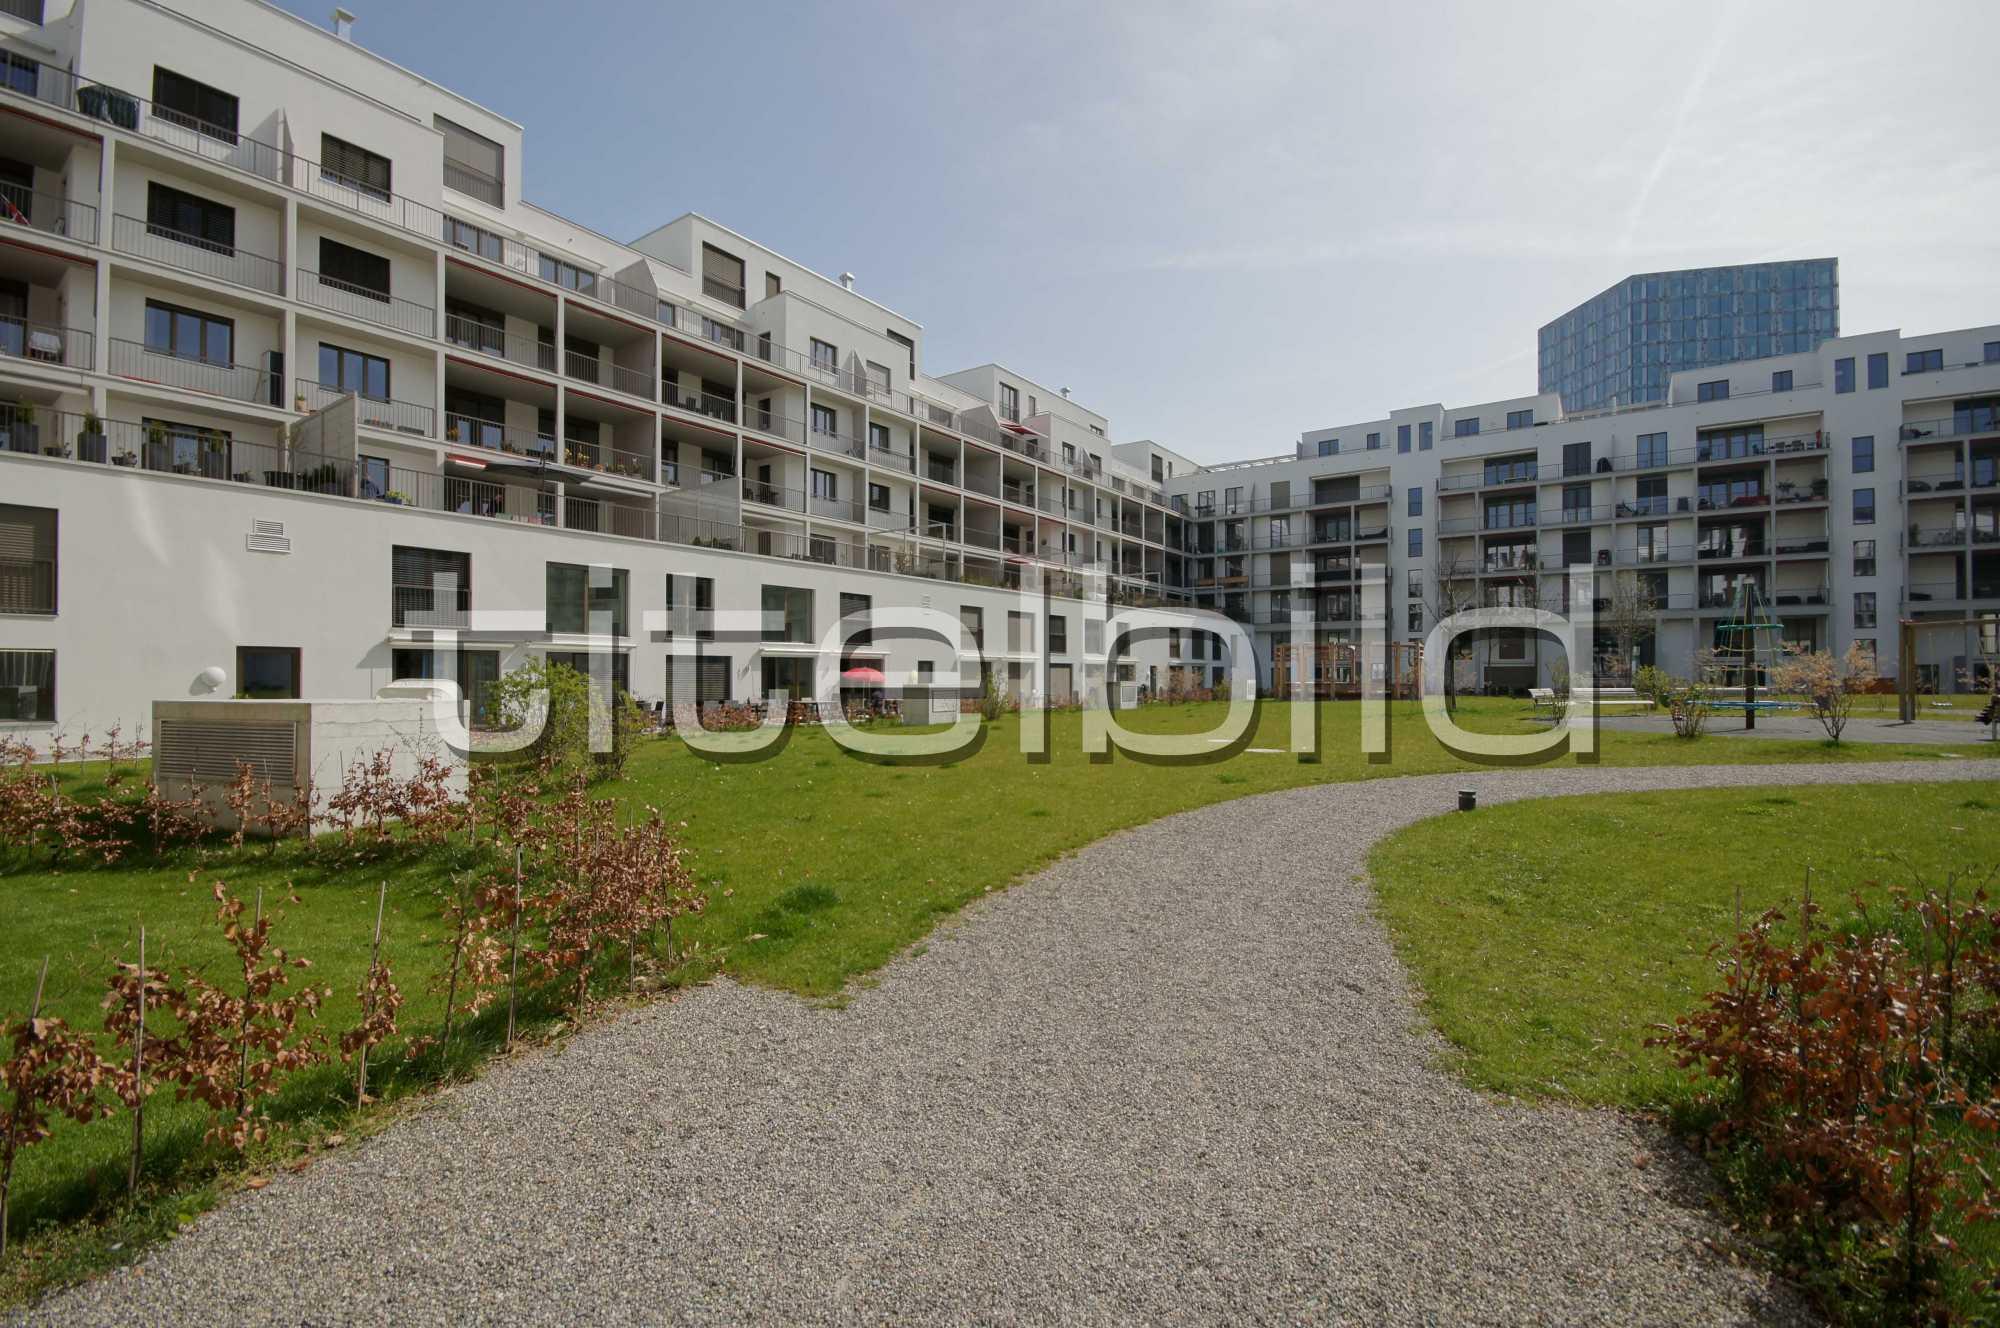 Projektbild-Nr. 6: Richti Areal Konradhof, Baufeld 1/7